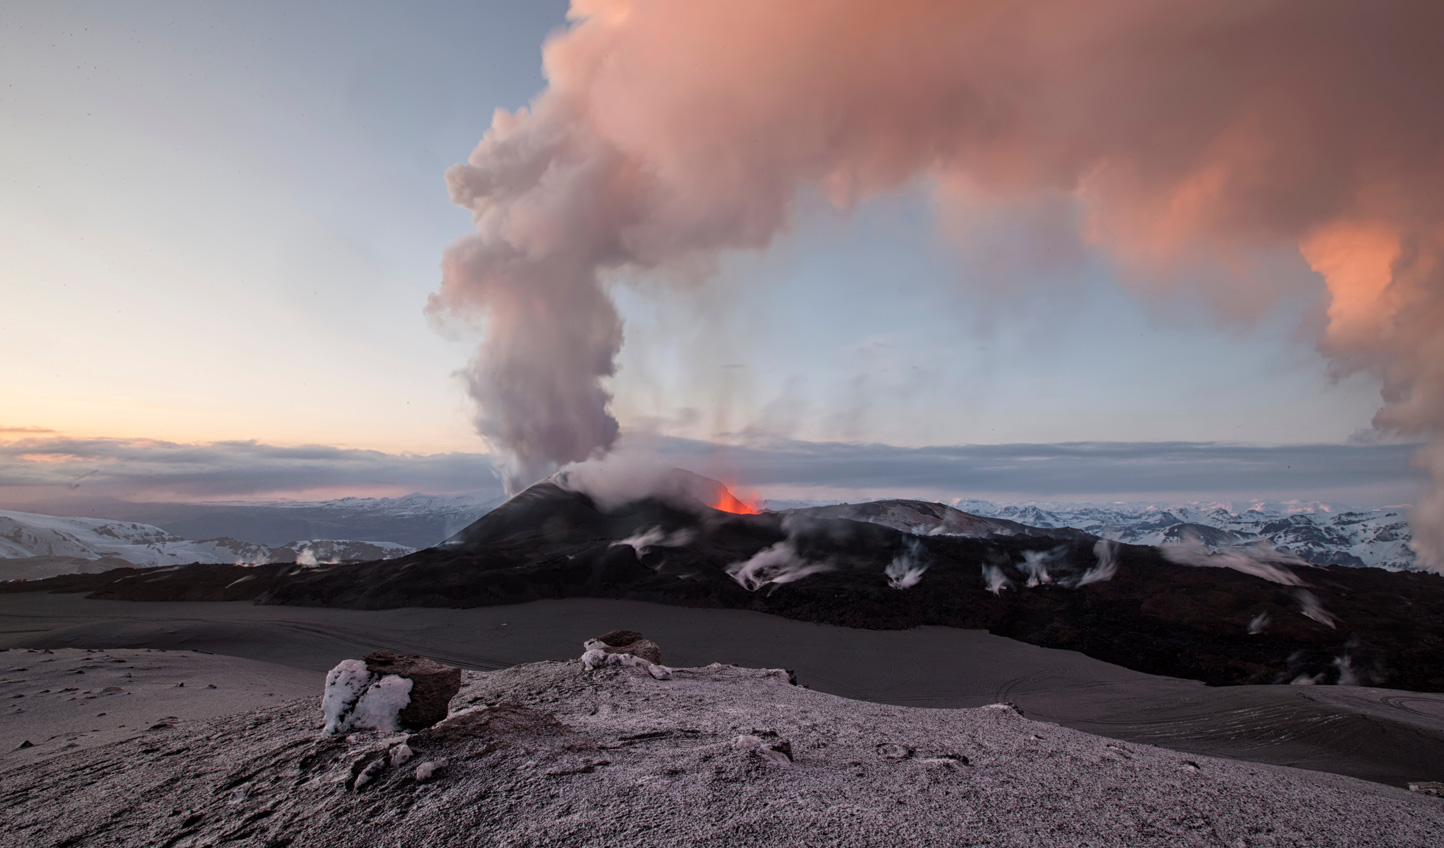 The smoke rising off Eyjafjallajokull